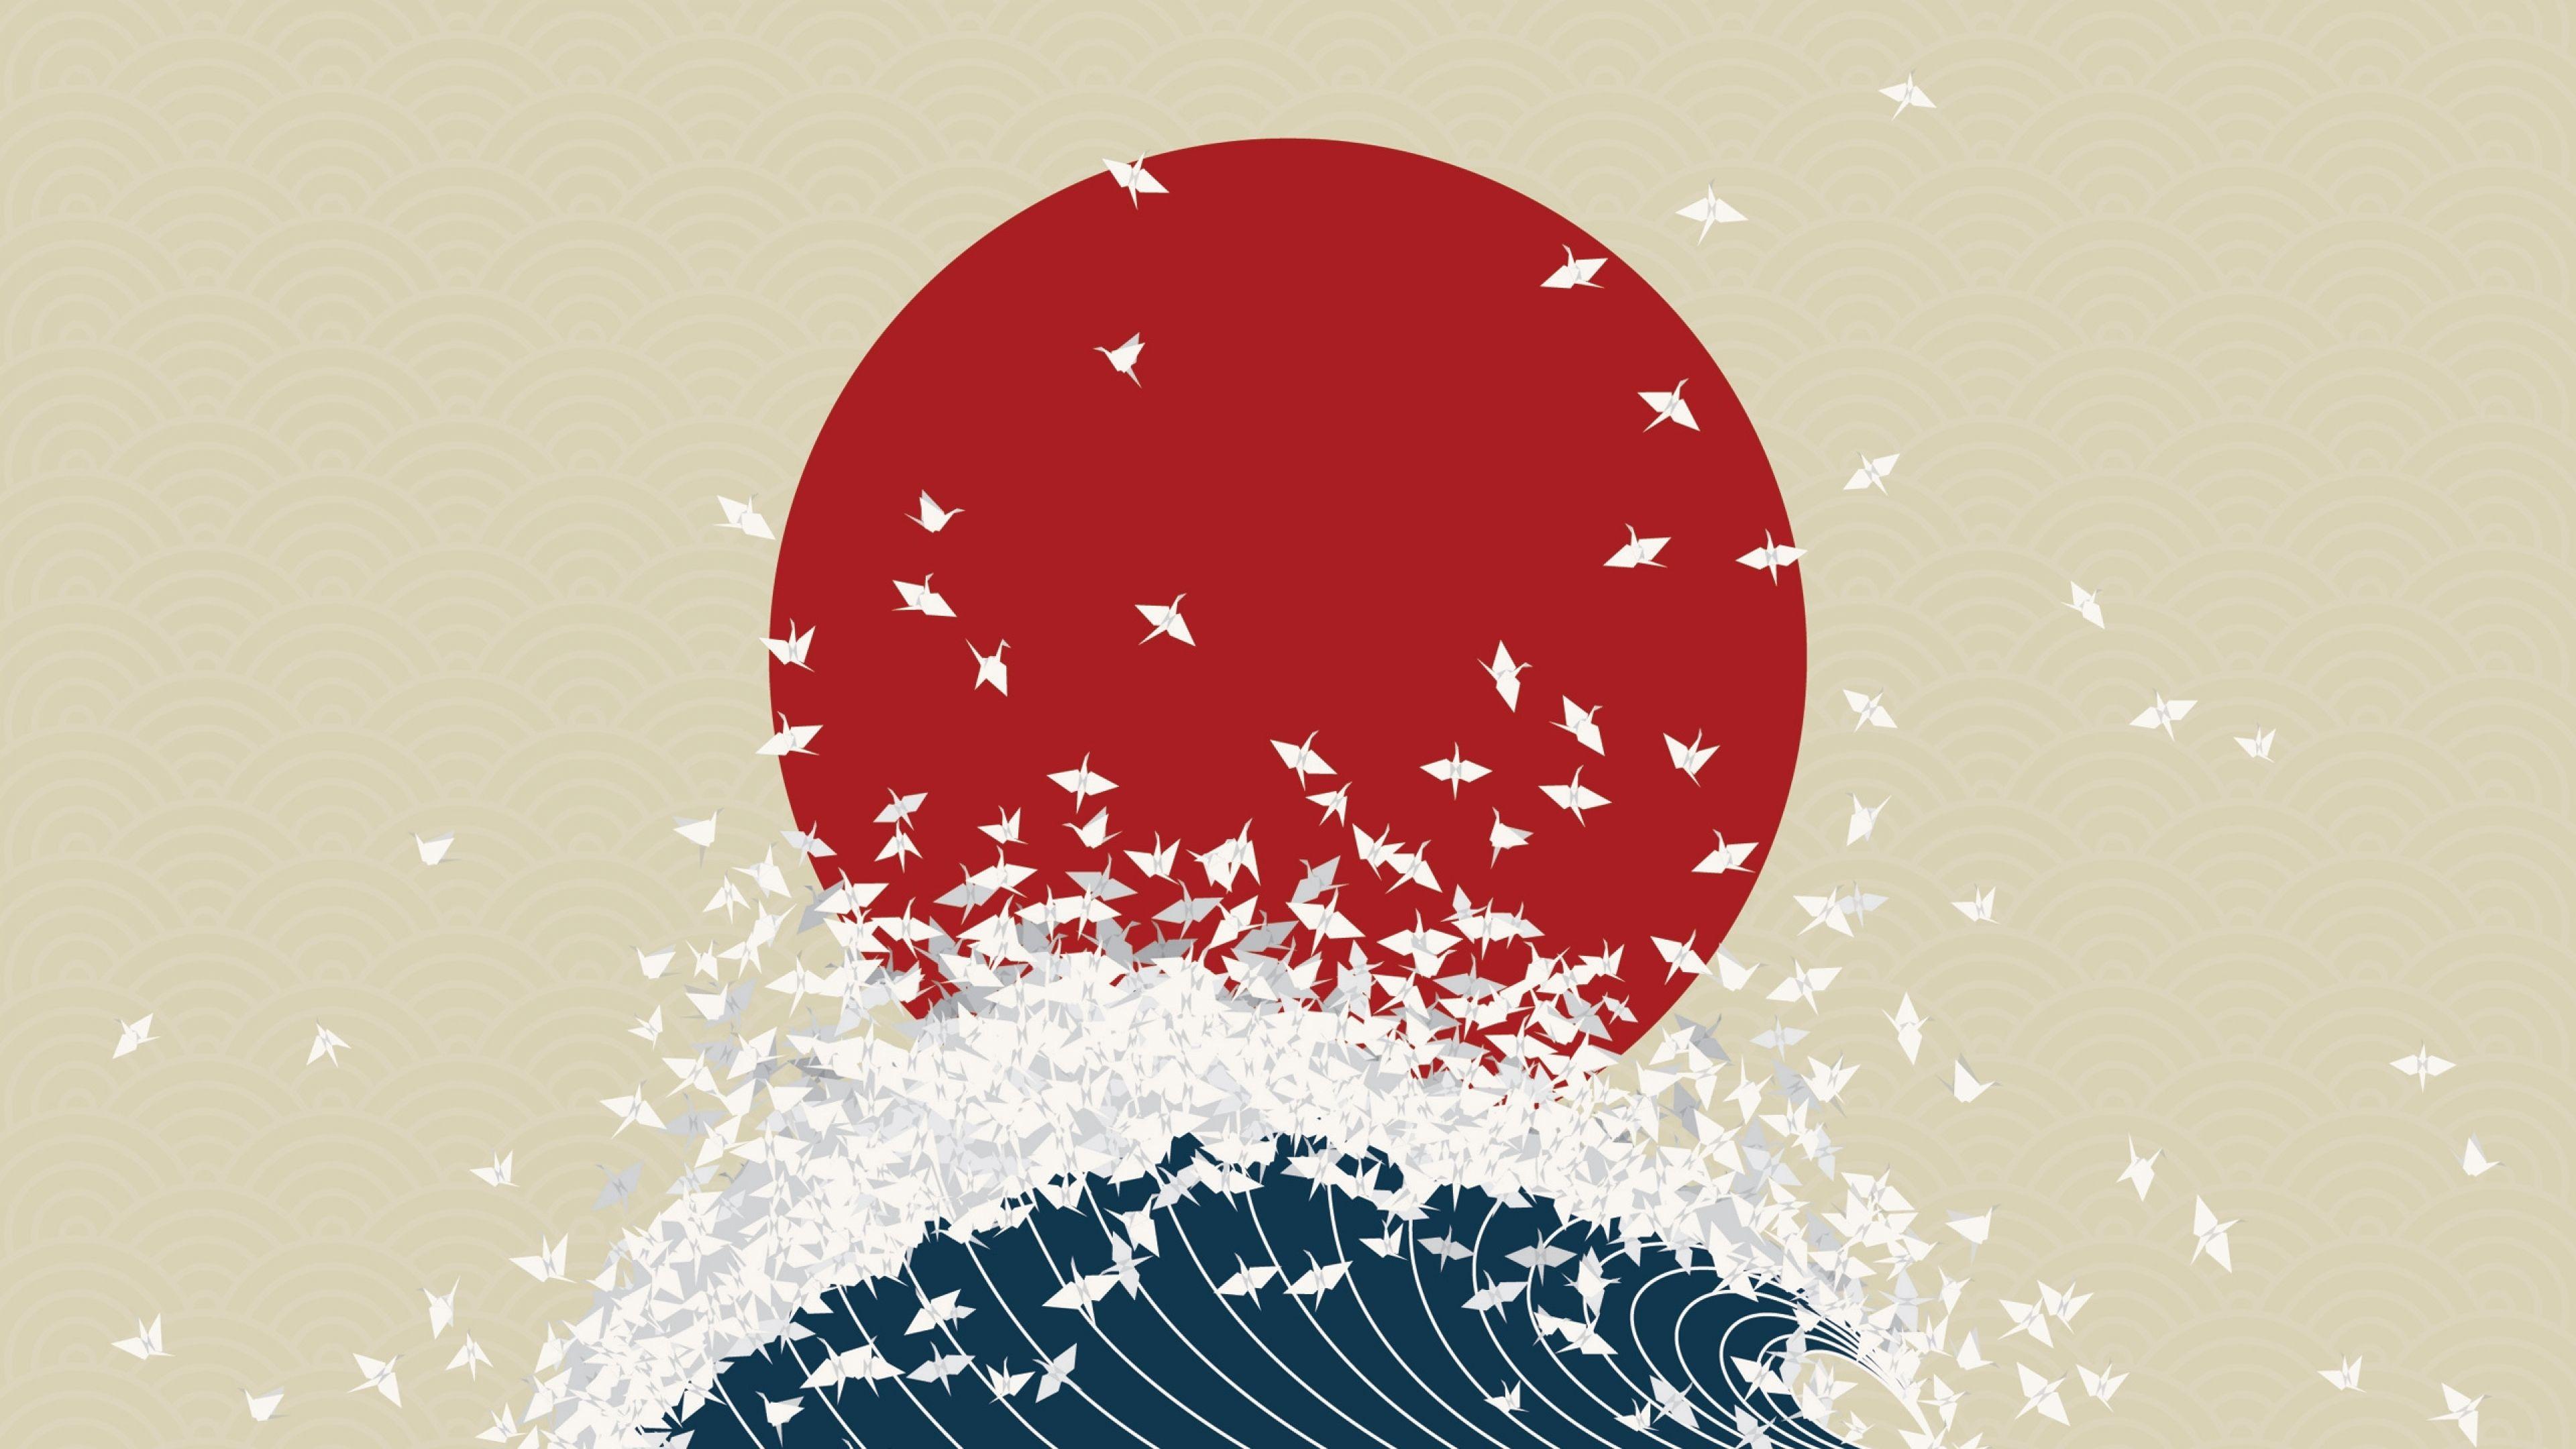 3840x2160 Wallpaper Minimalism Origami Japan Rising Sun Wave Origami Art Gambar